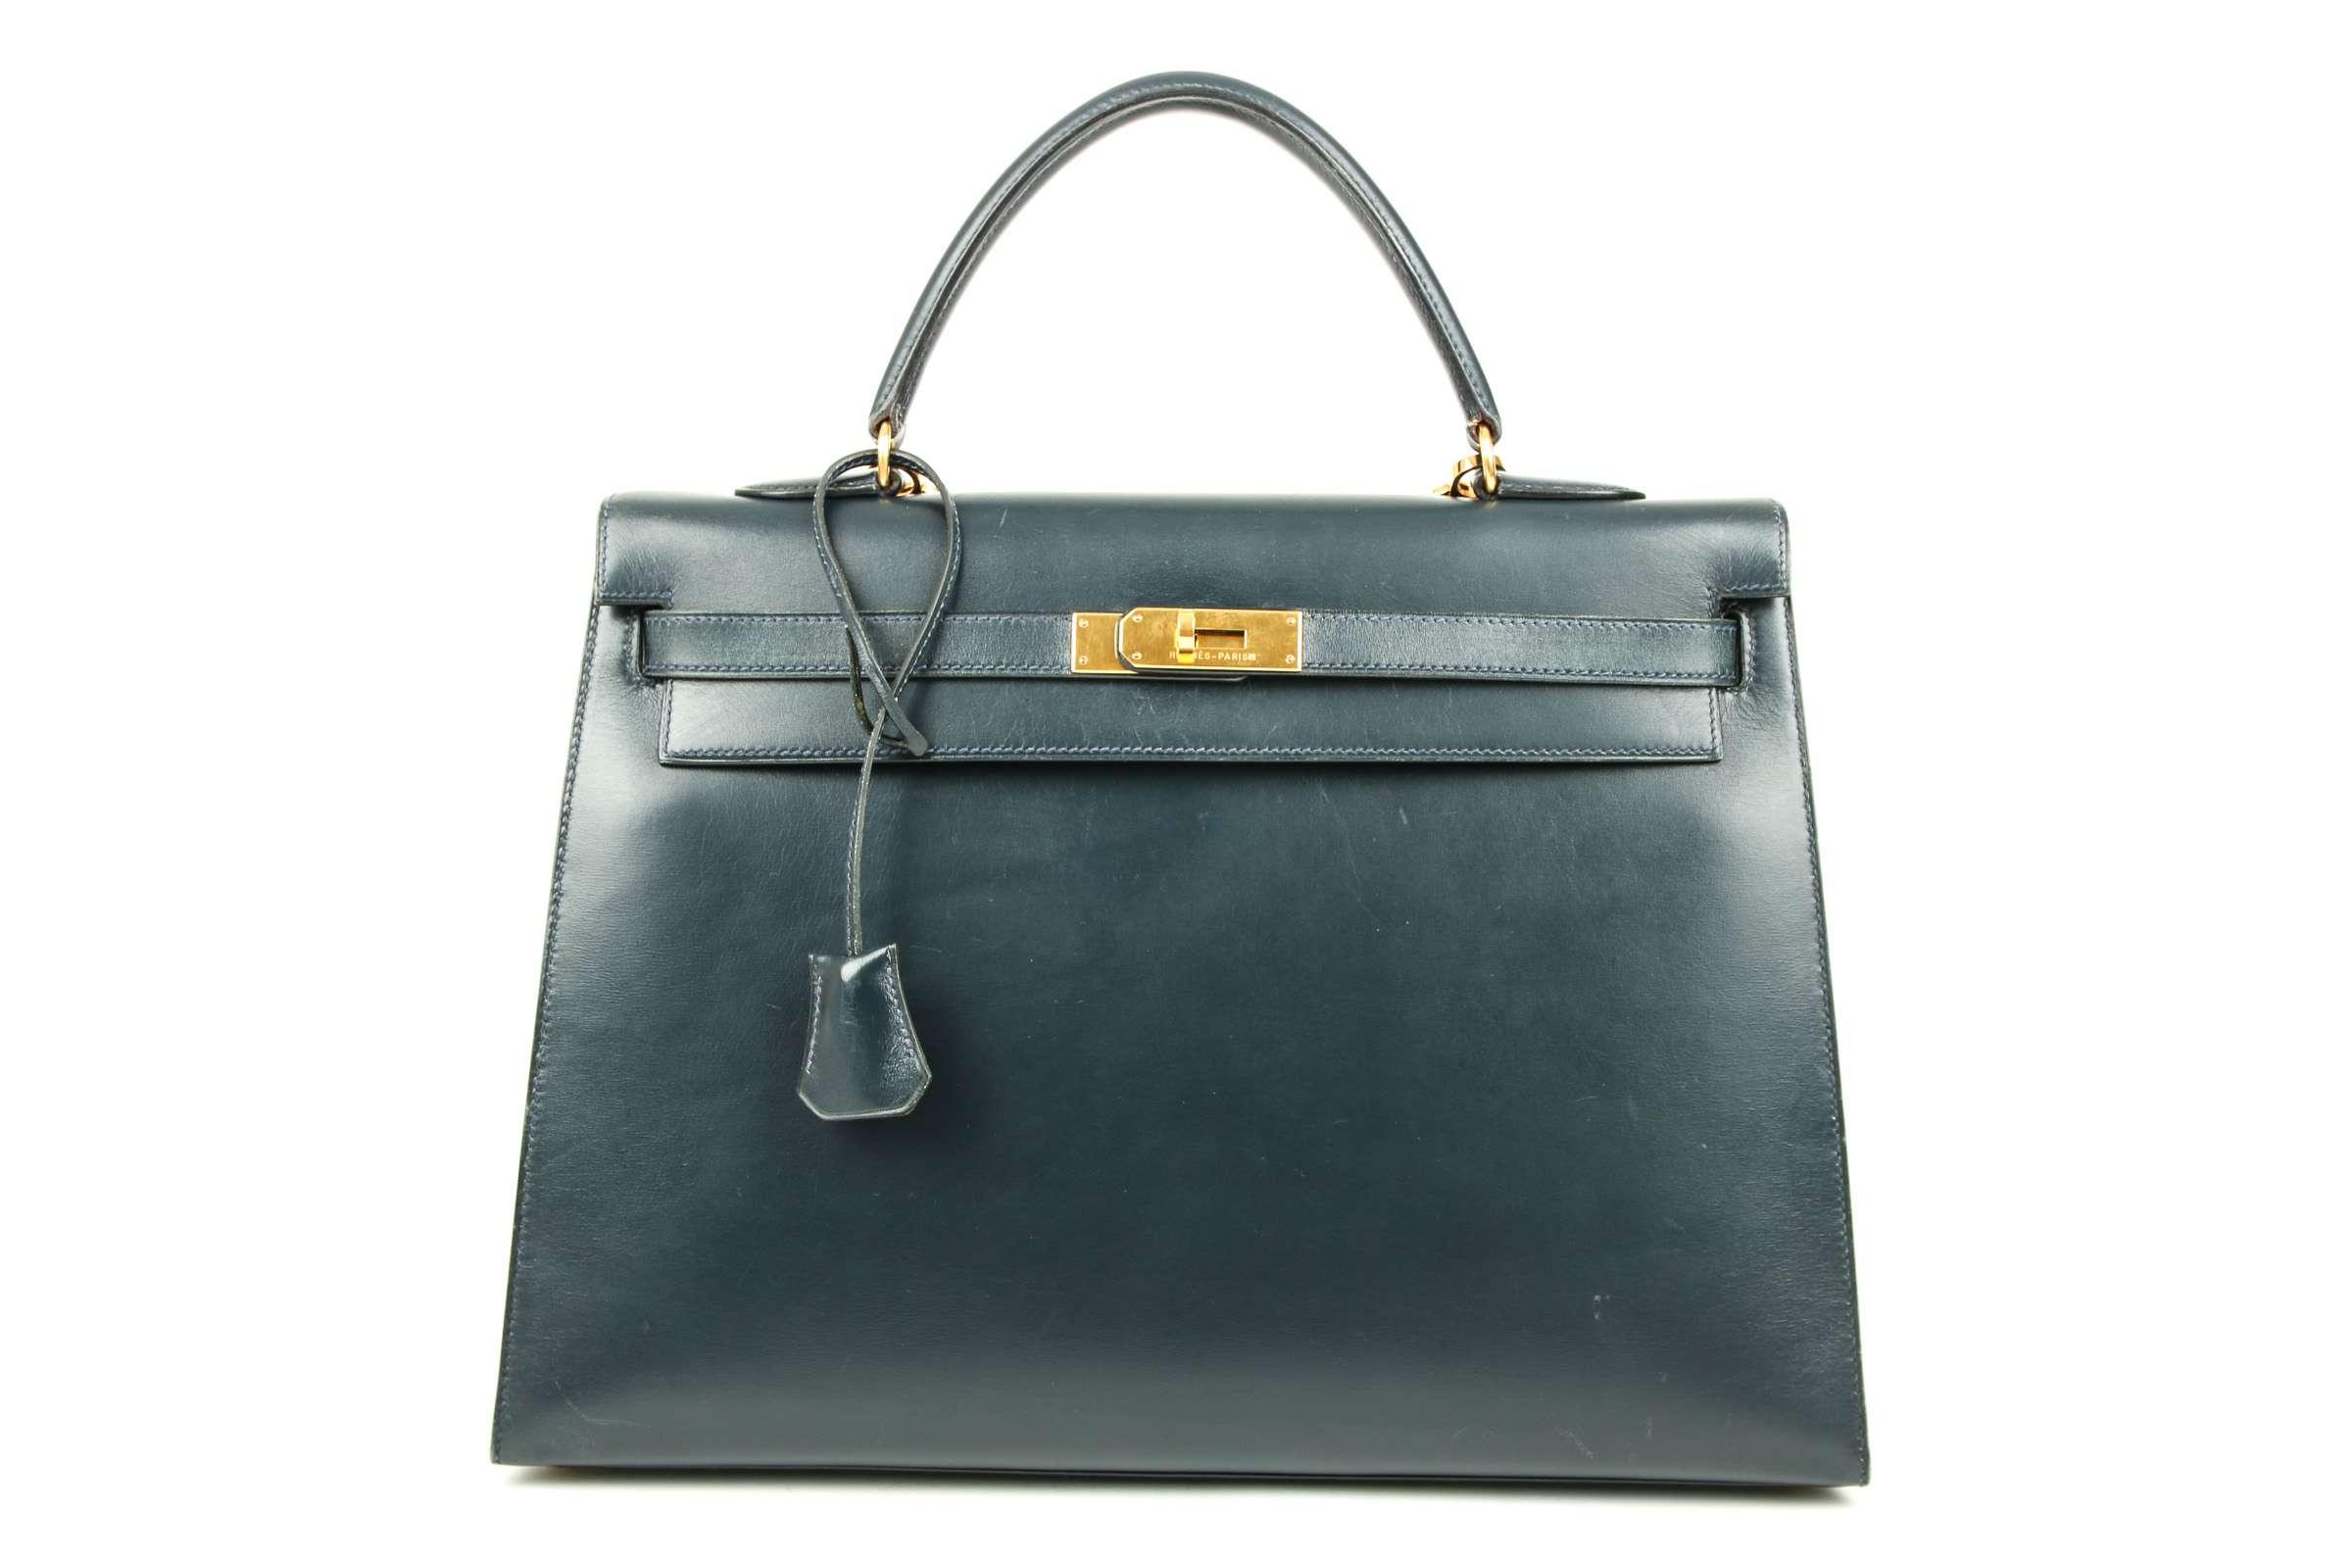 9c8ff6f17c72 Hermès Kelly Bag 35 Dark blue with shoulder strap